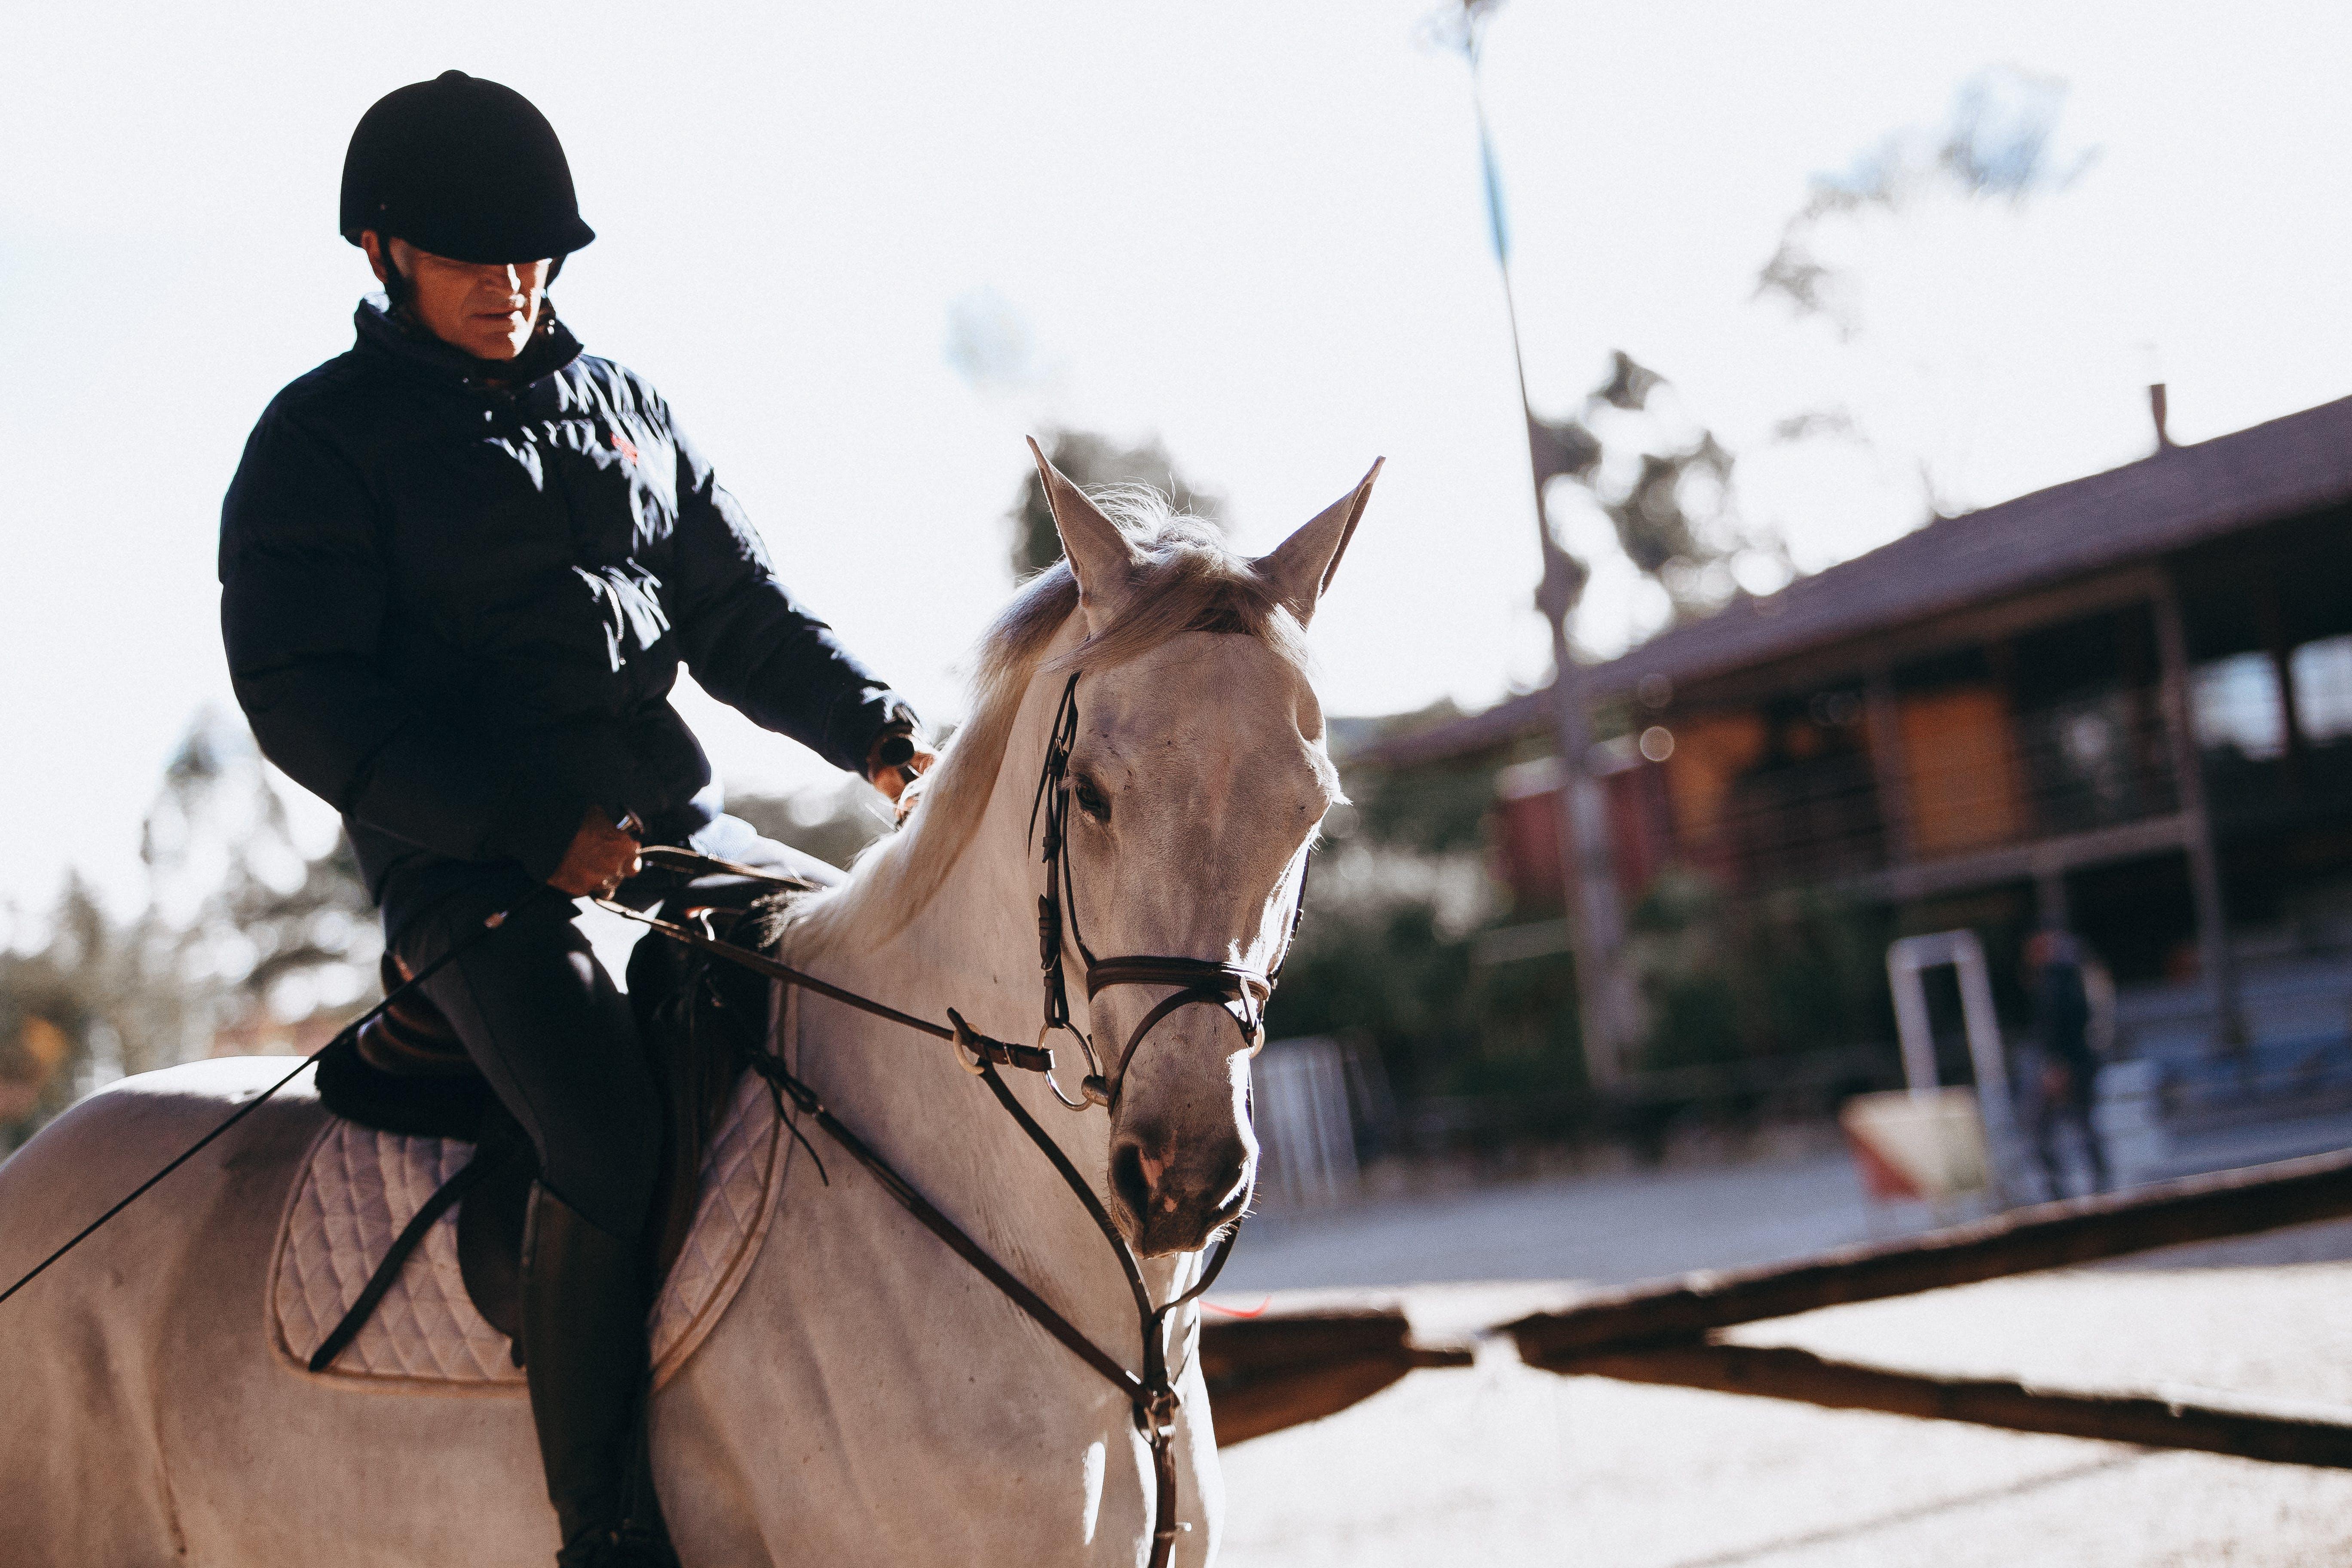 Man riding on horse   Photo: Pexels